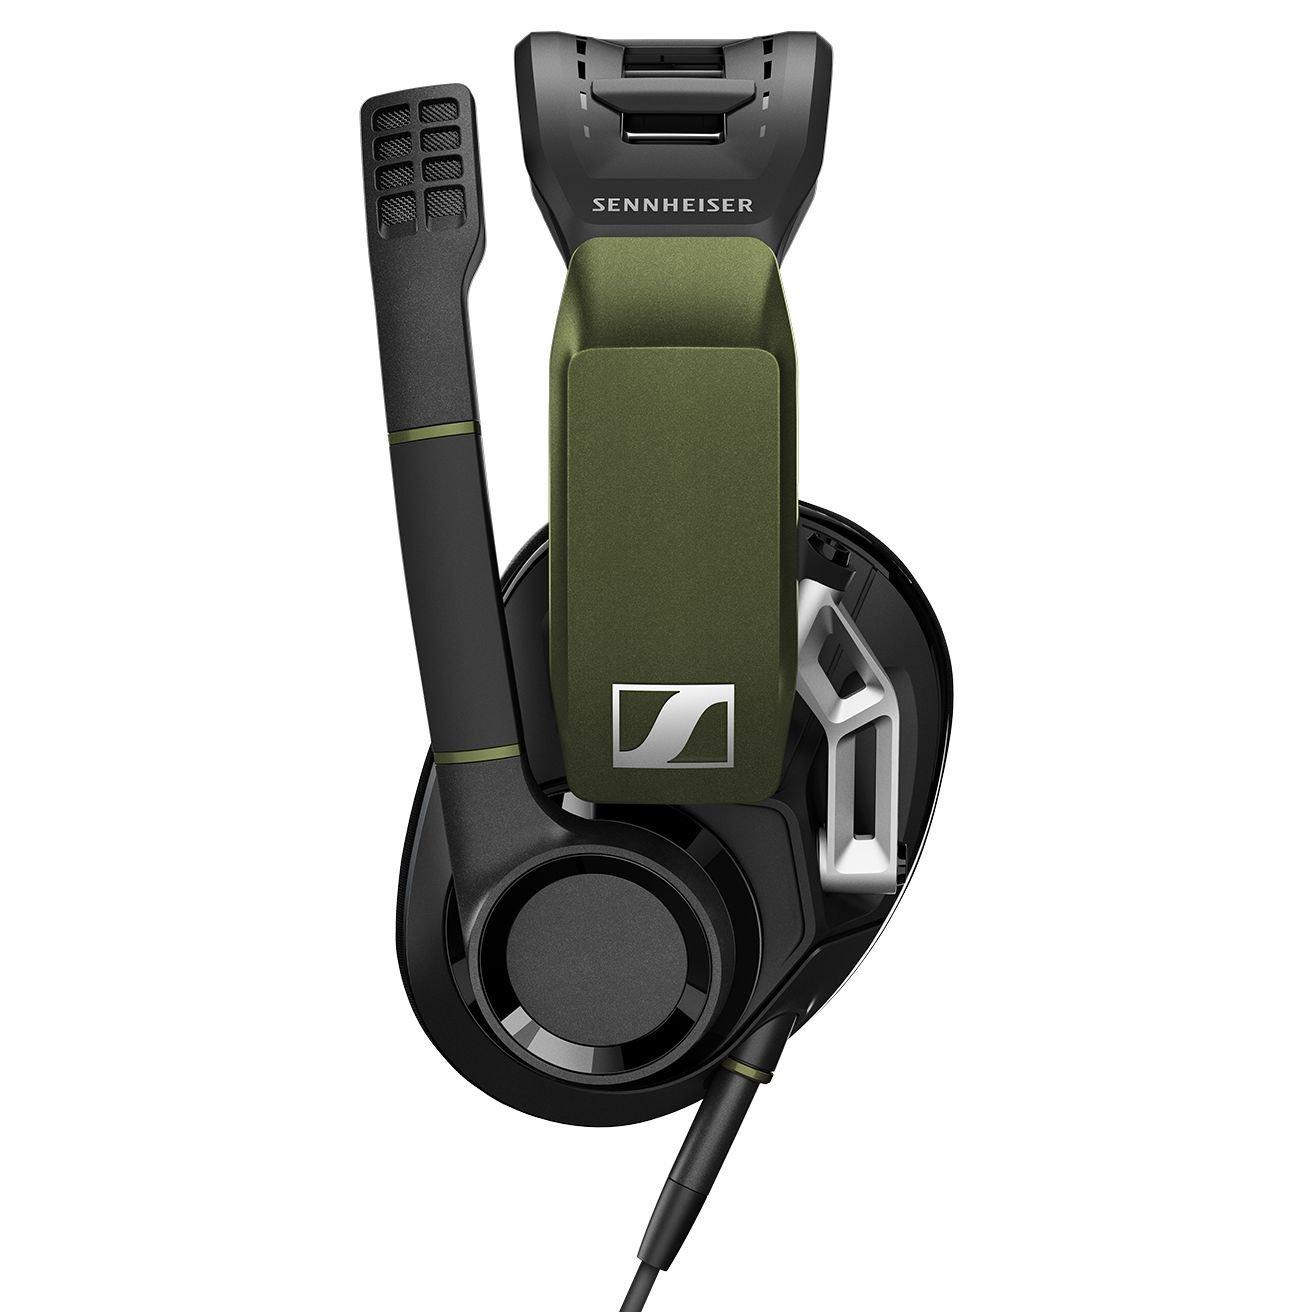 EPOS Sennheiser GSP 550 7.1 Dolby Surround Sound Gaming Headset for  image